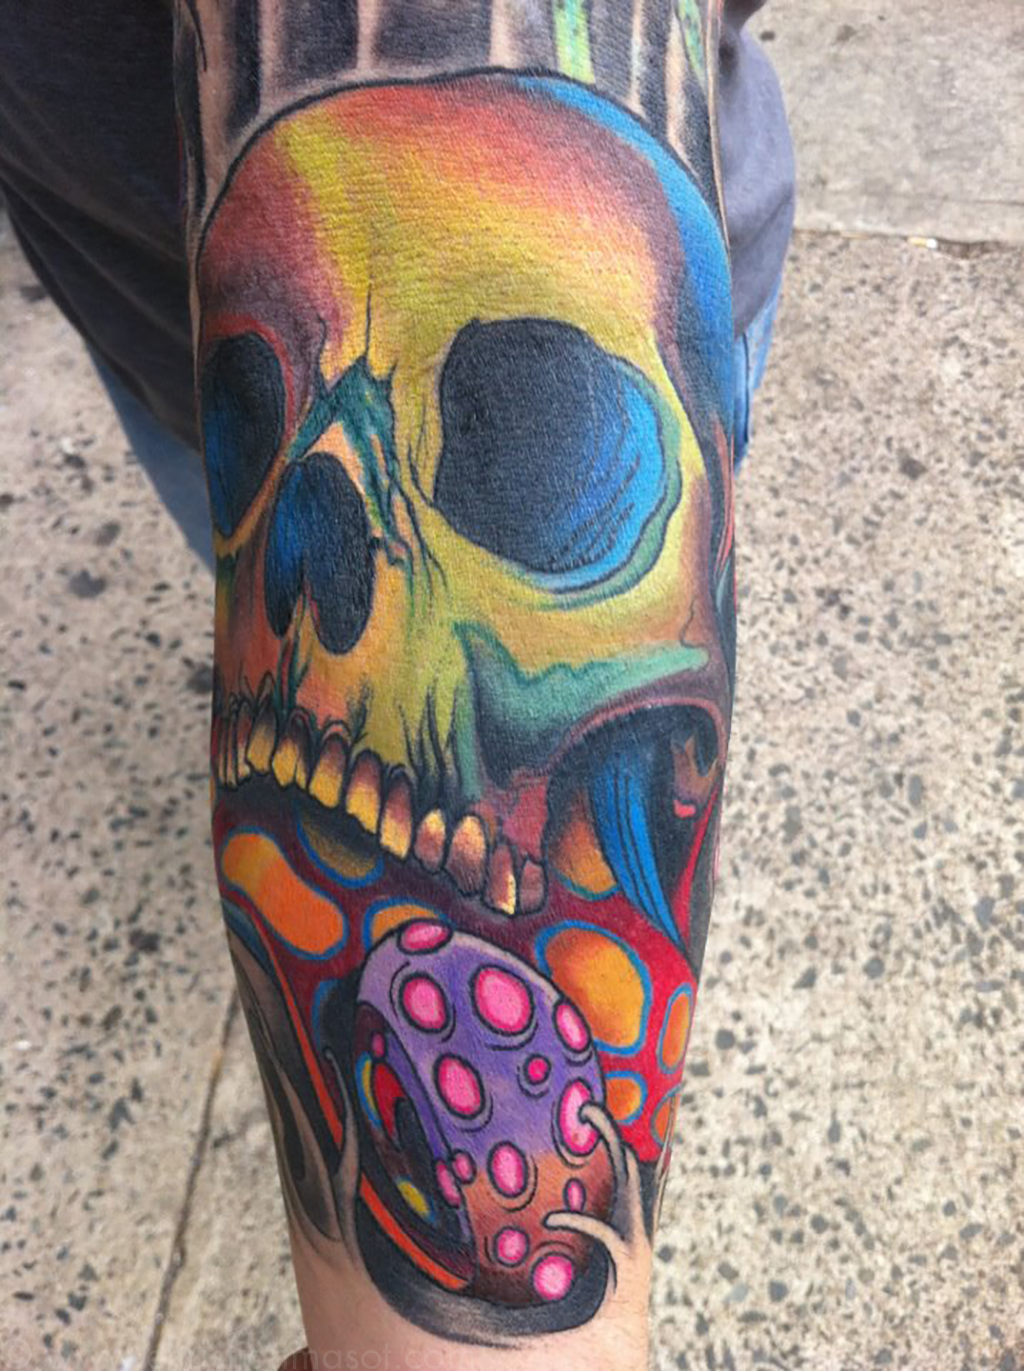 christian_masot_tattoo_16.png